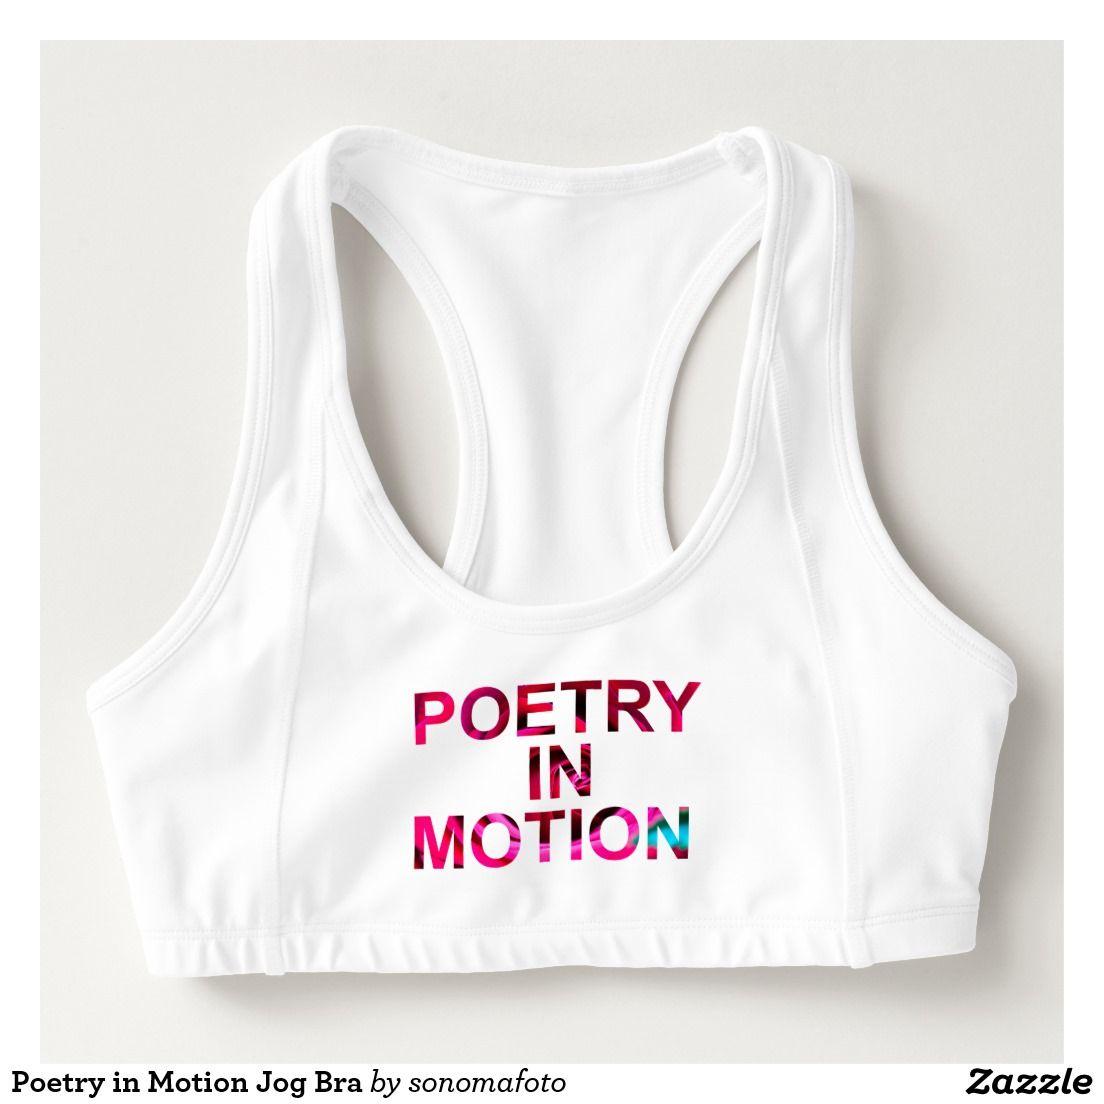 Poetry in Motion Jog Bra Sports Bra